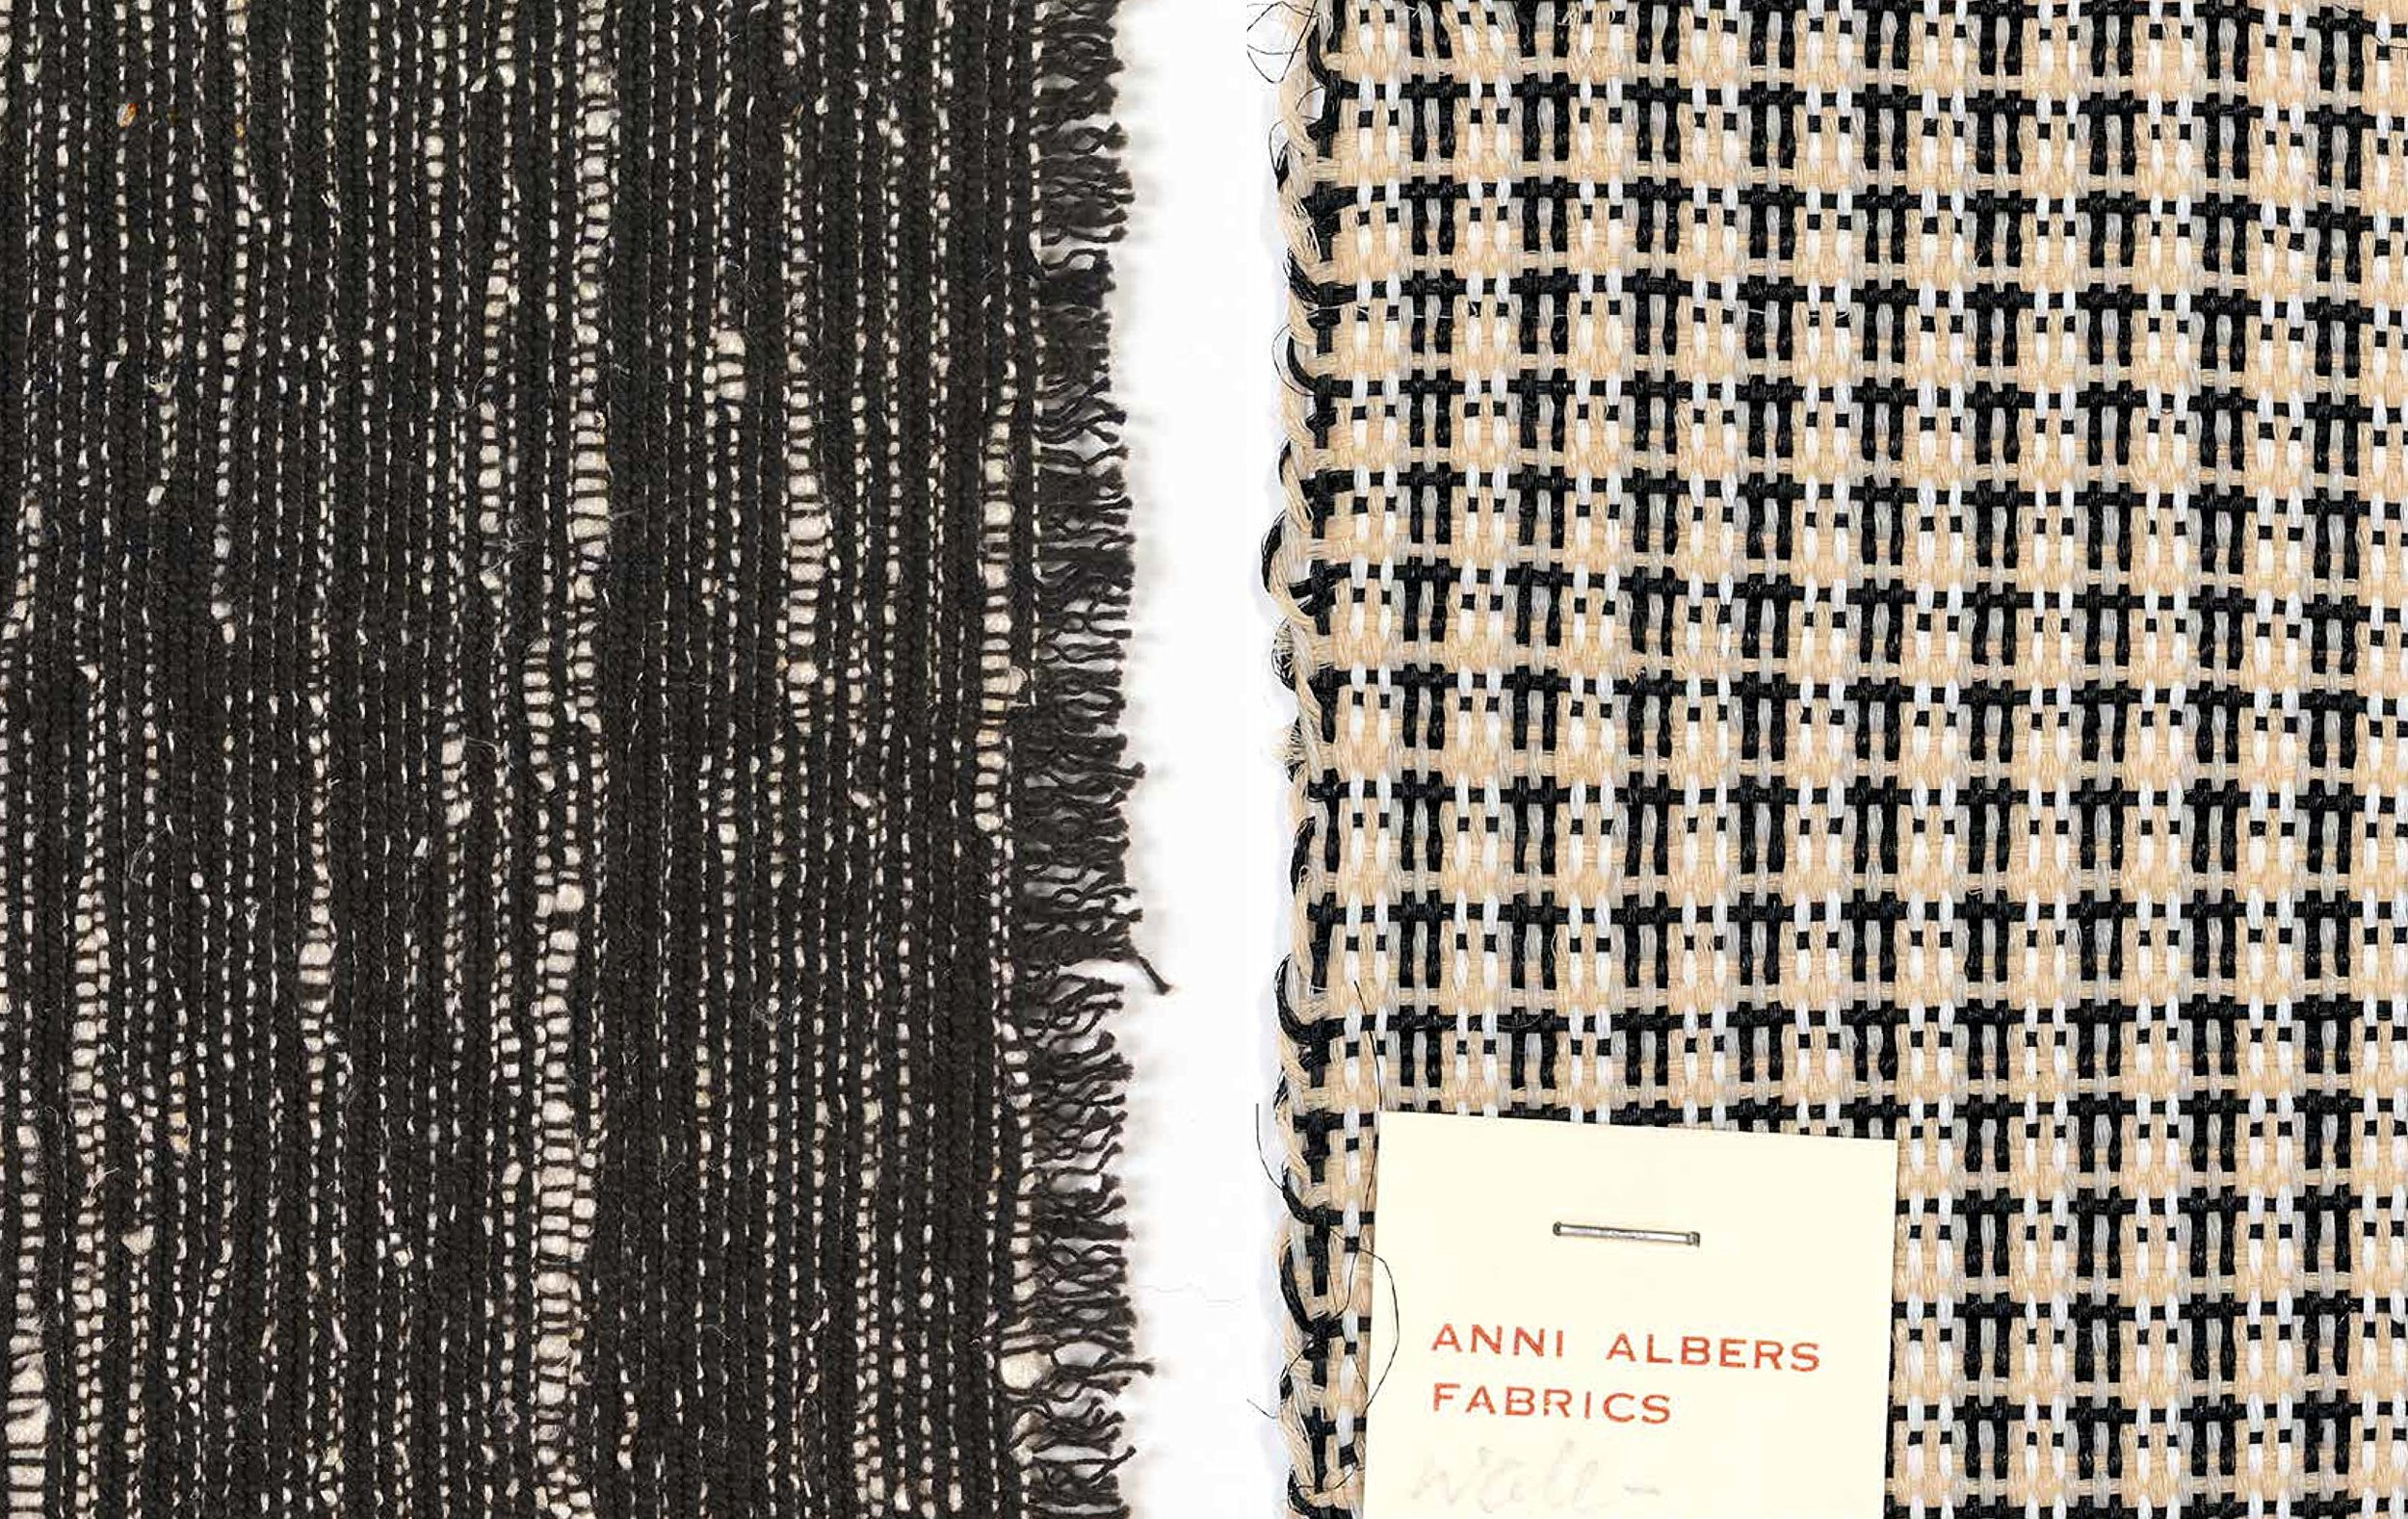 Anni Albers textile samplers. Tate publication